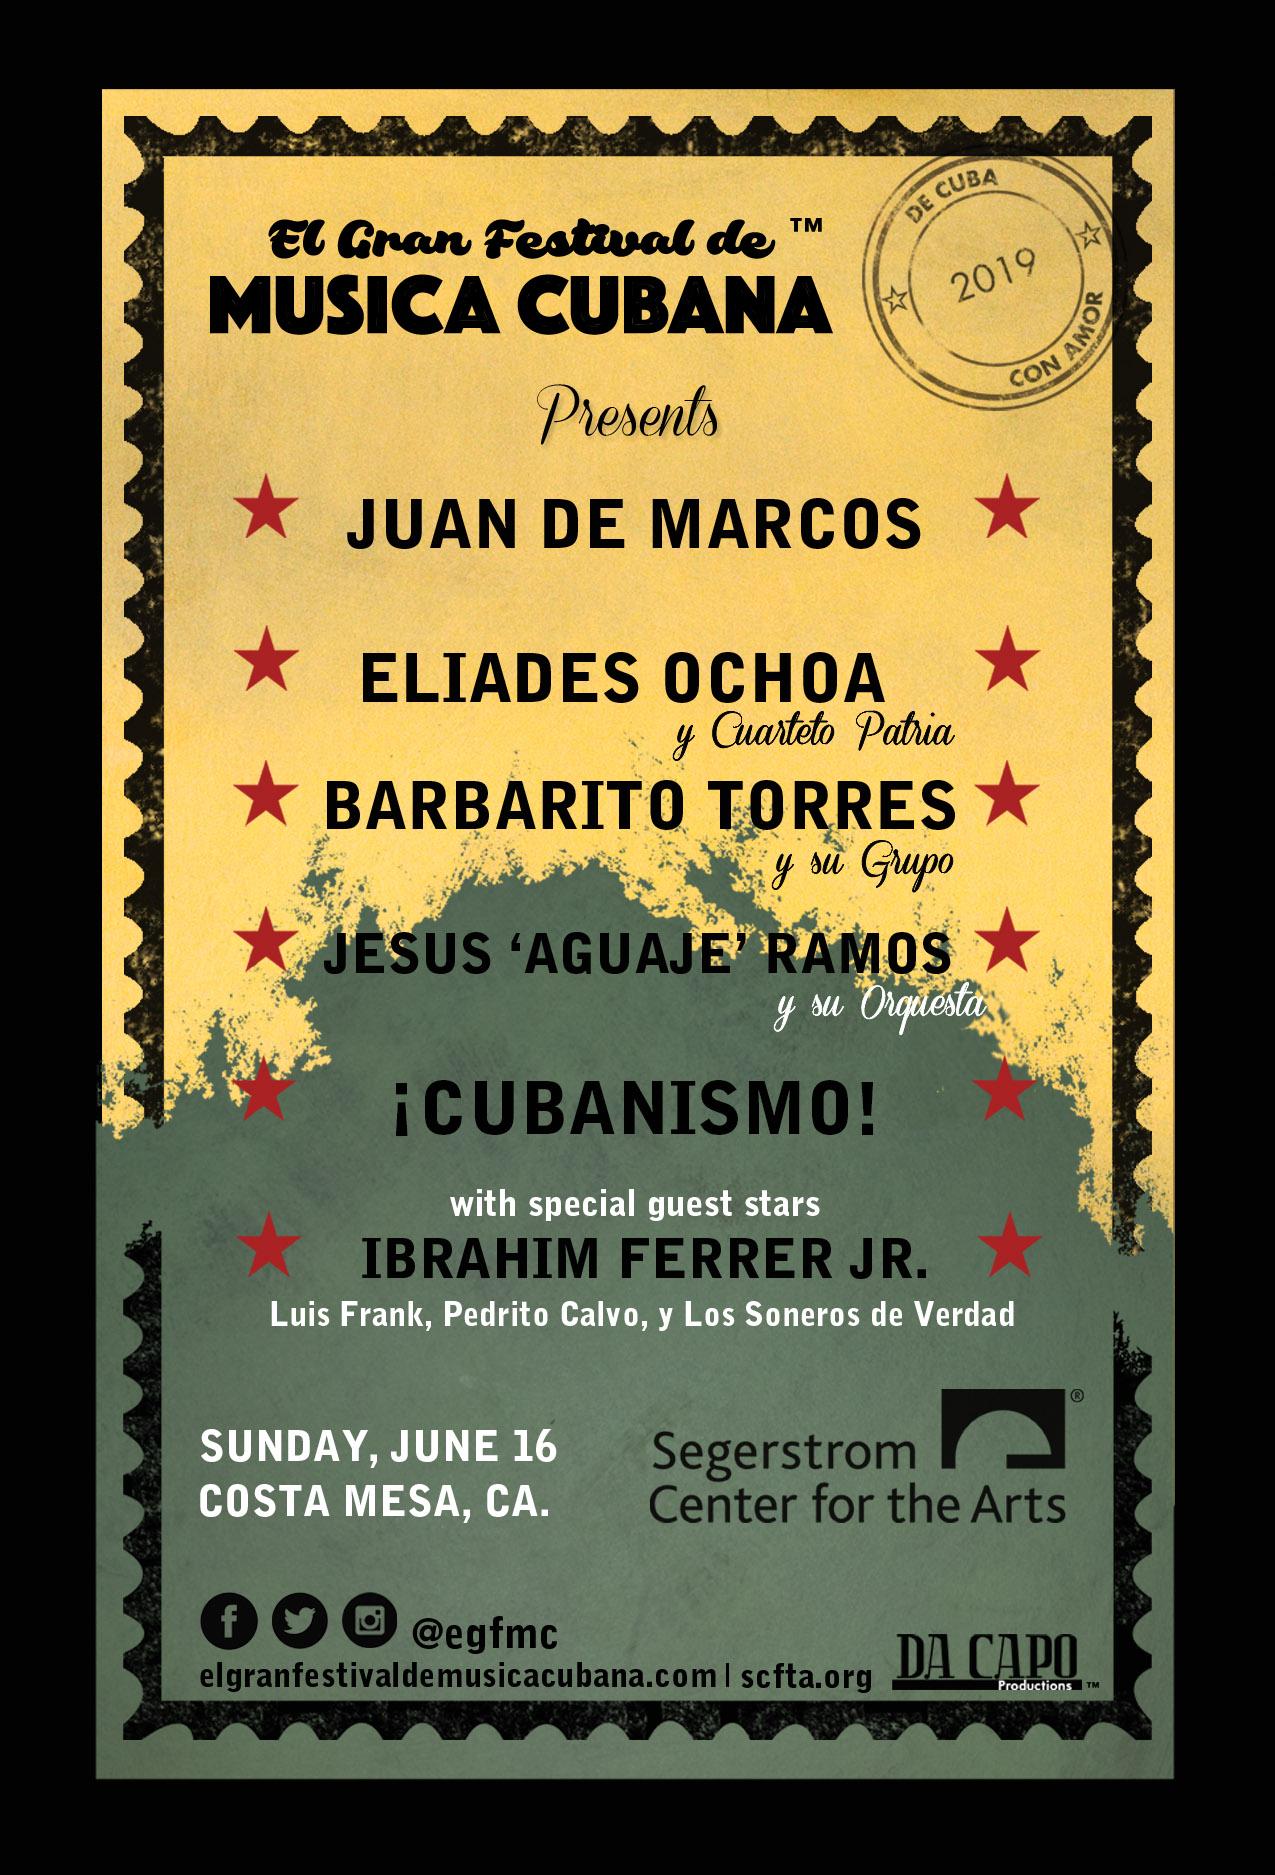 Segerstrom Center for the Arts presenta El Gran Festival de Musica Cubana